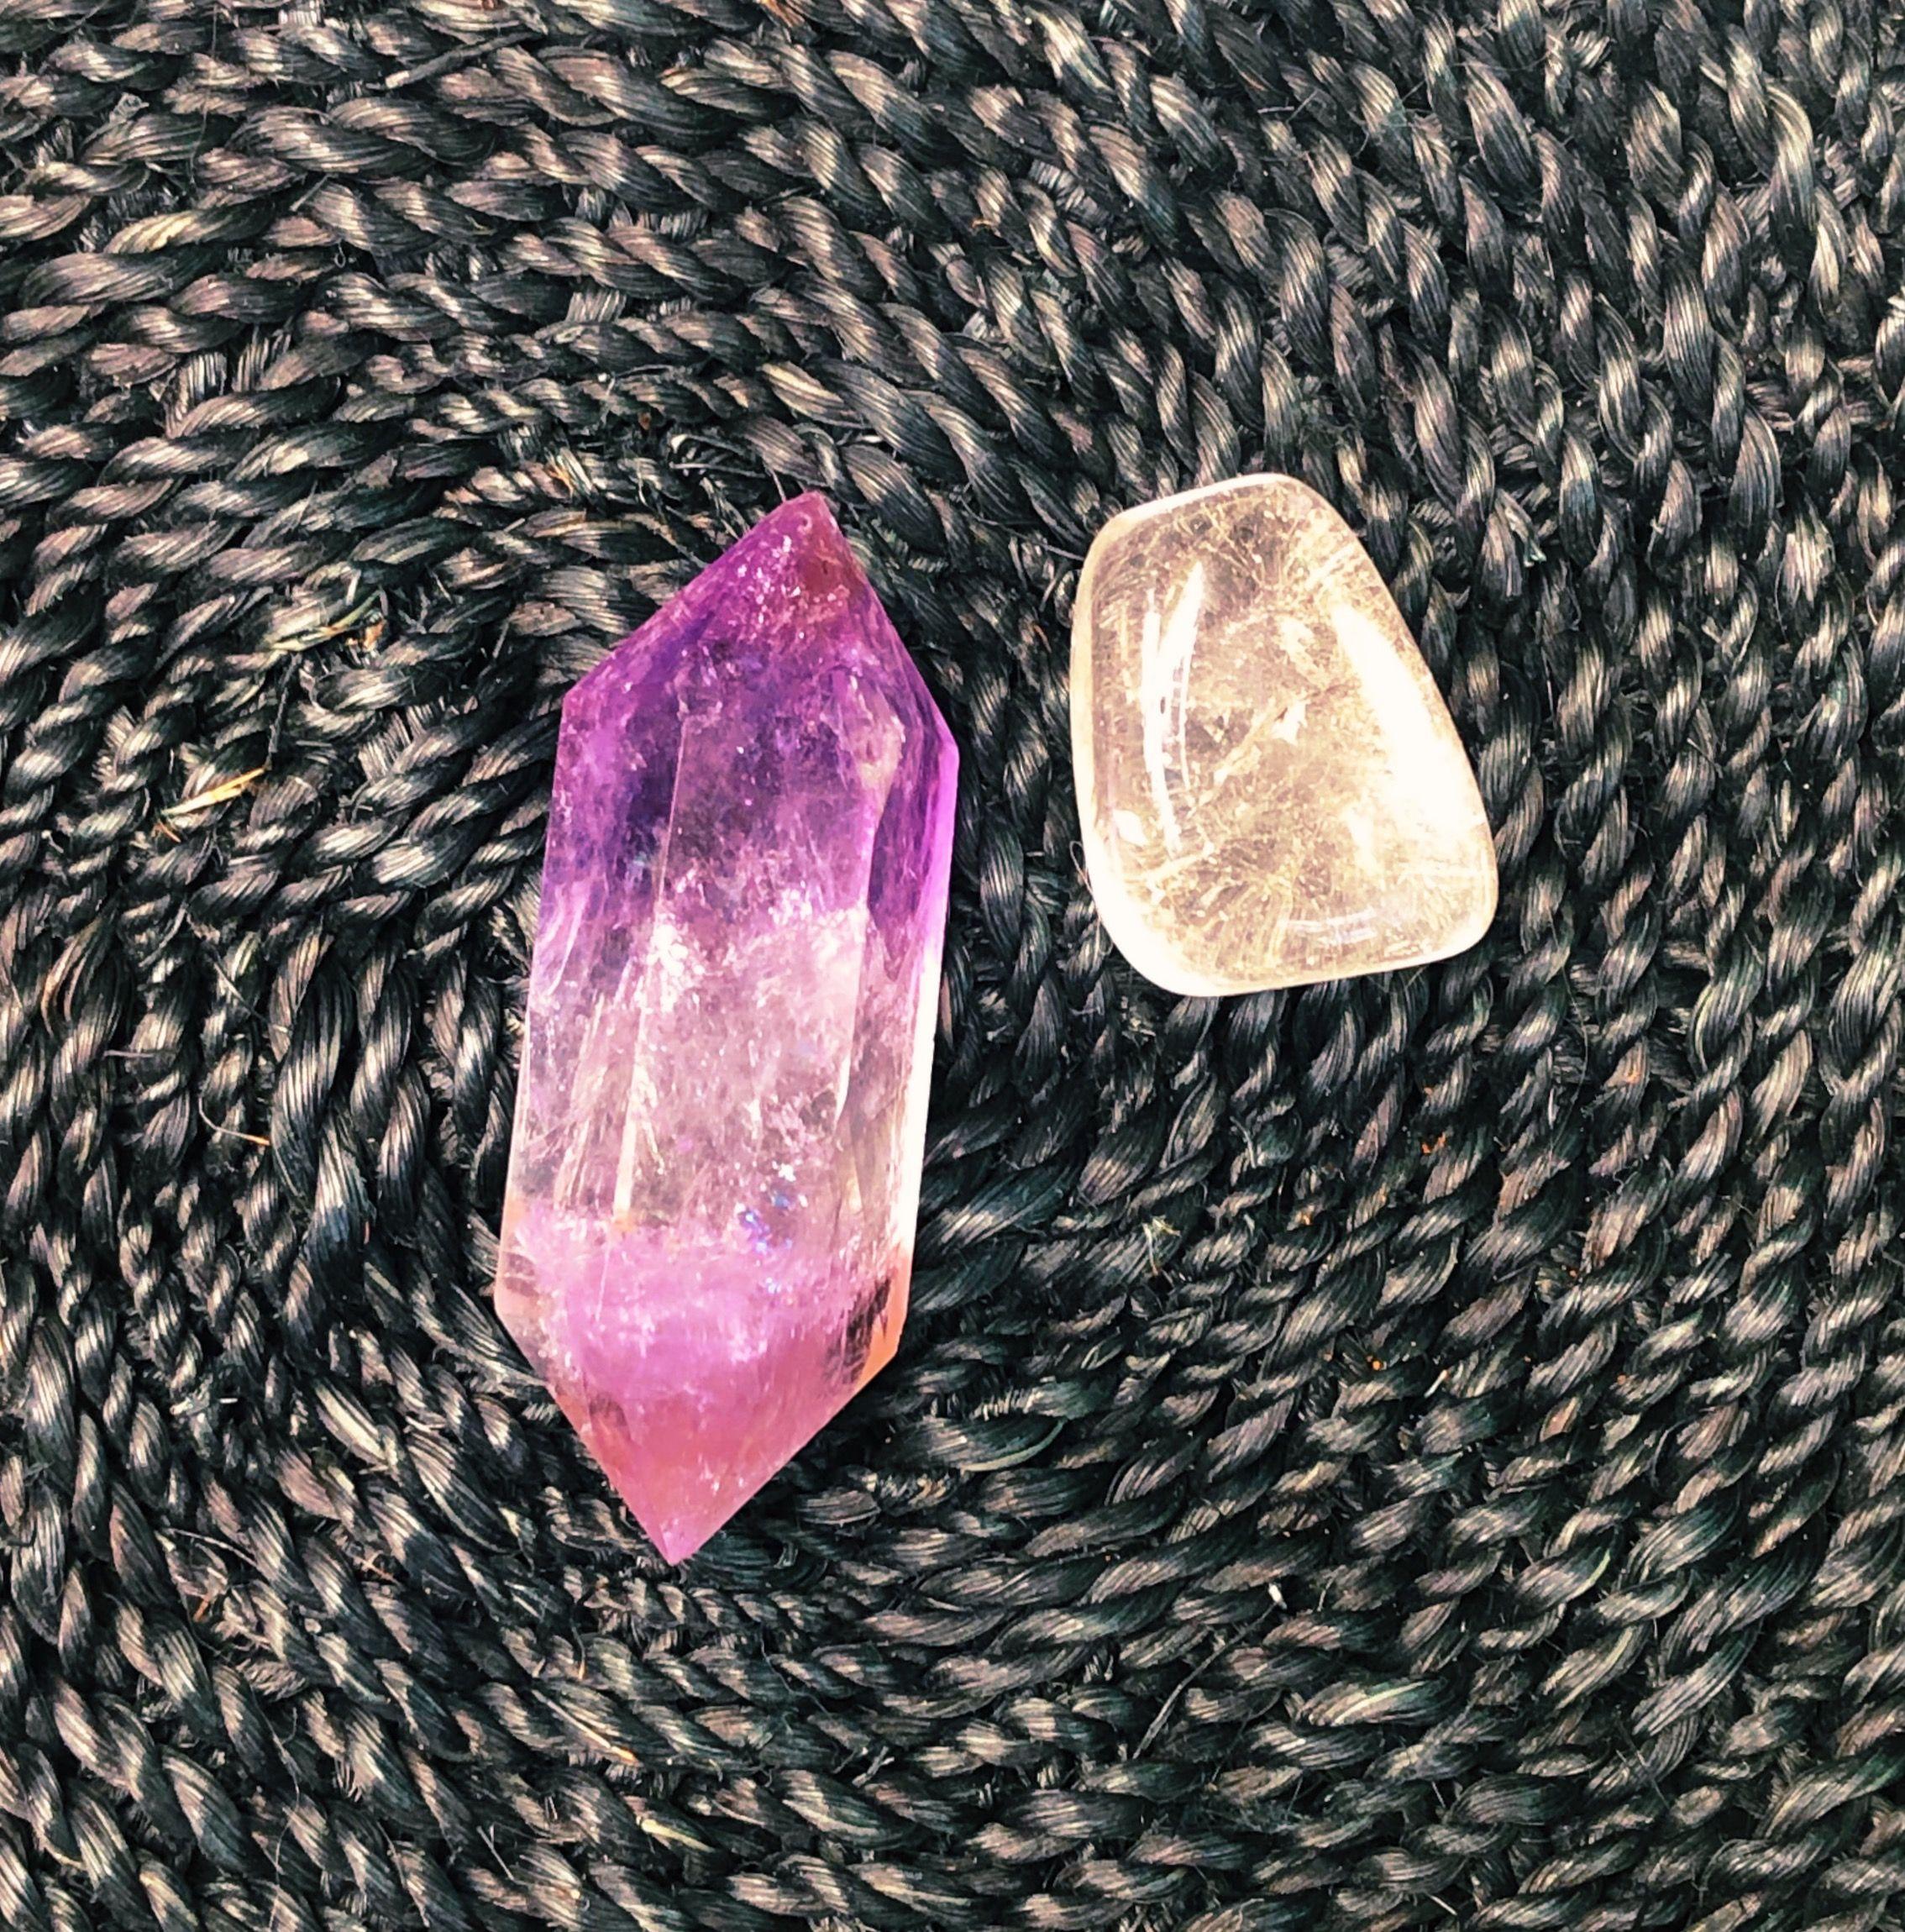 amethyst and clear quartz crystals